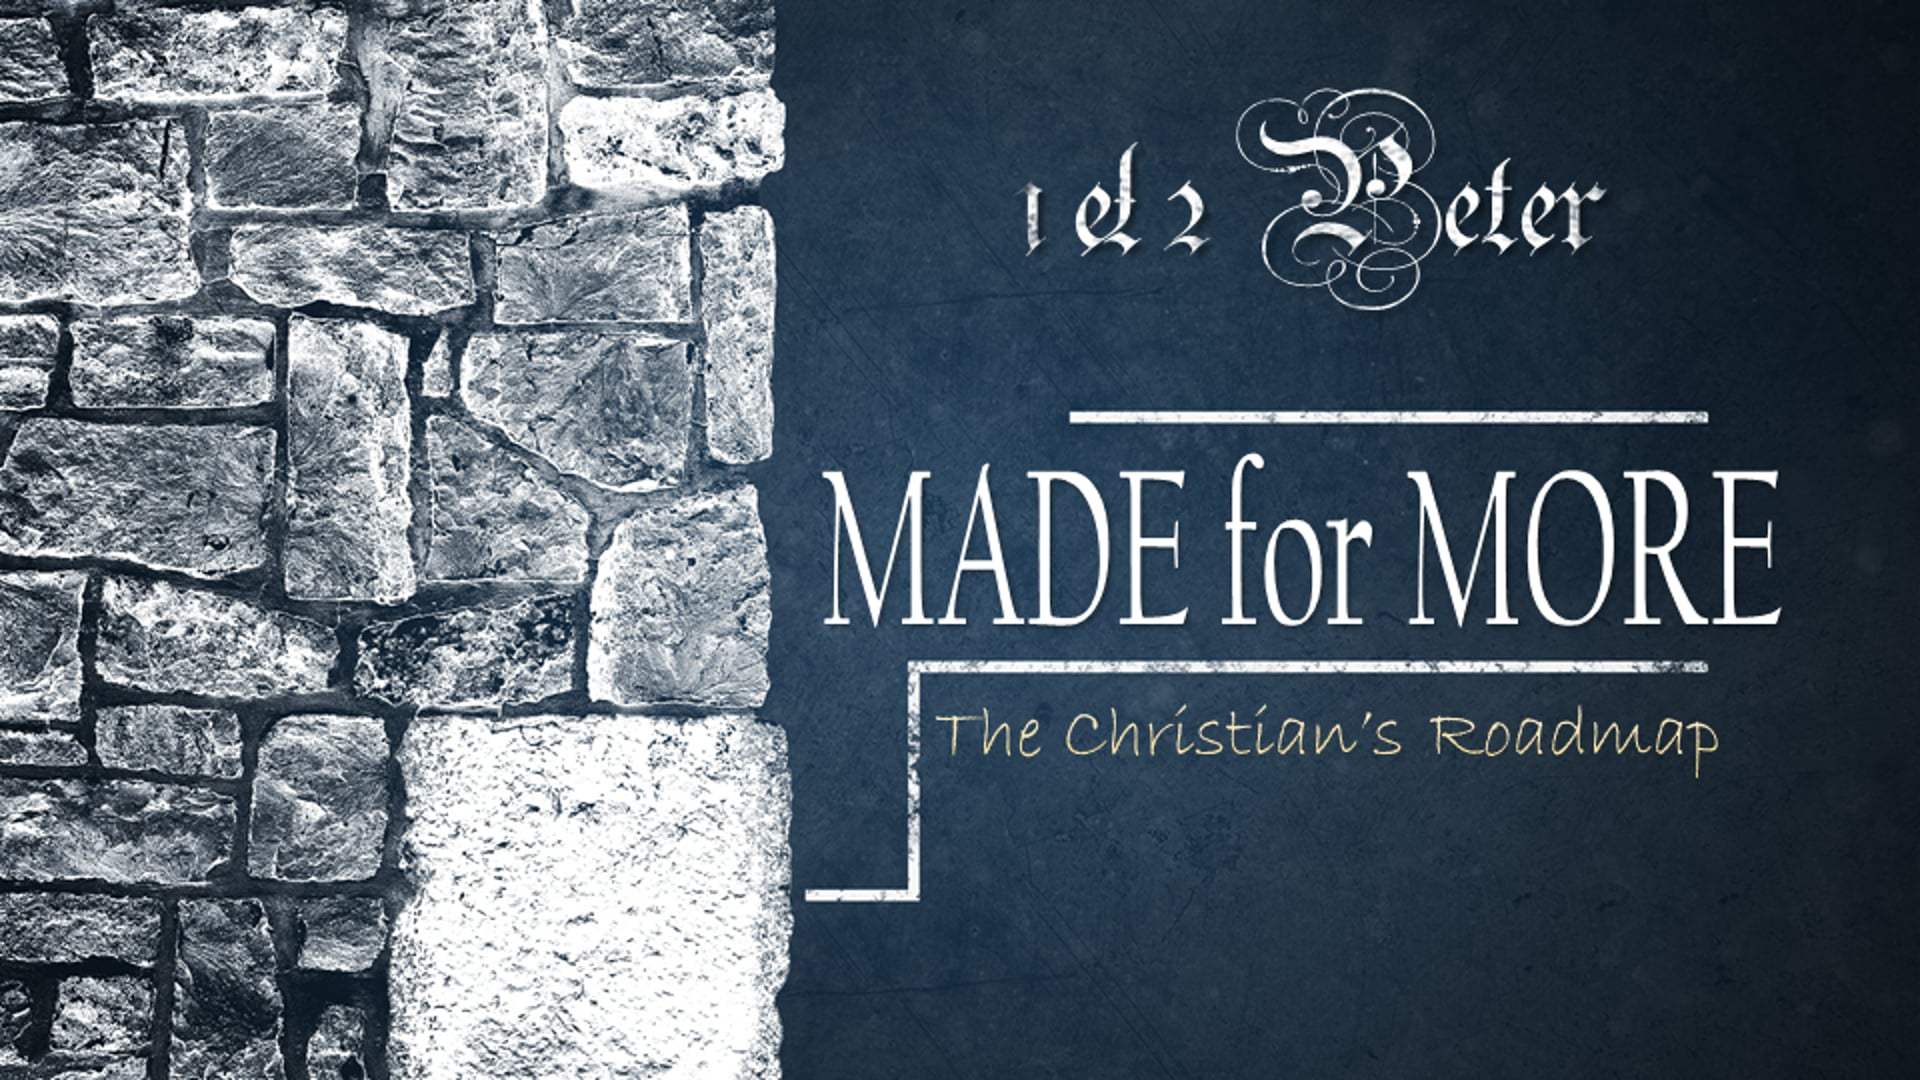 CCC Online Worship - August 9, 2020